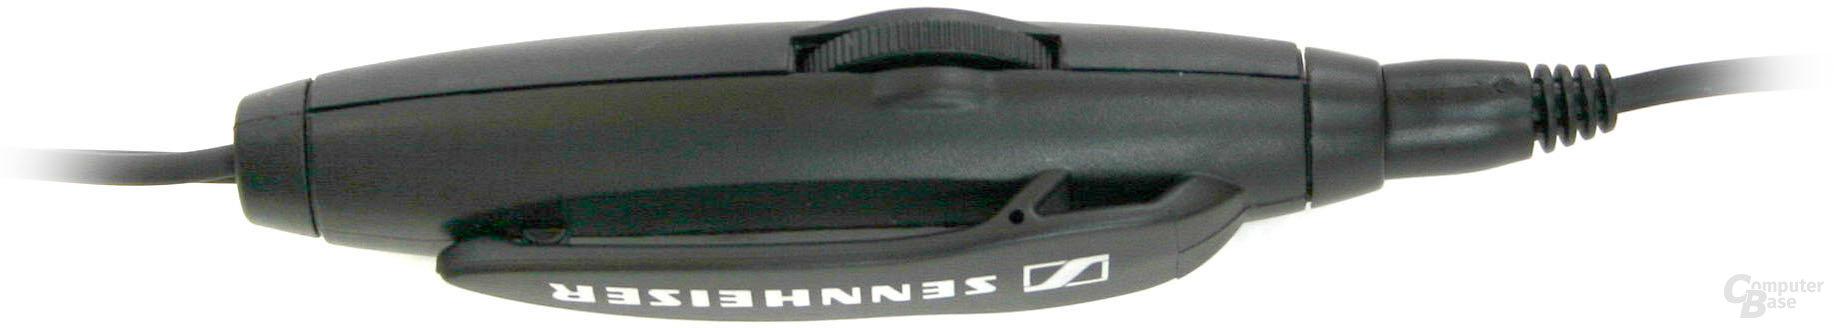 Sennheiser PC 140 Kabelschalter #2